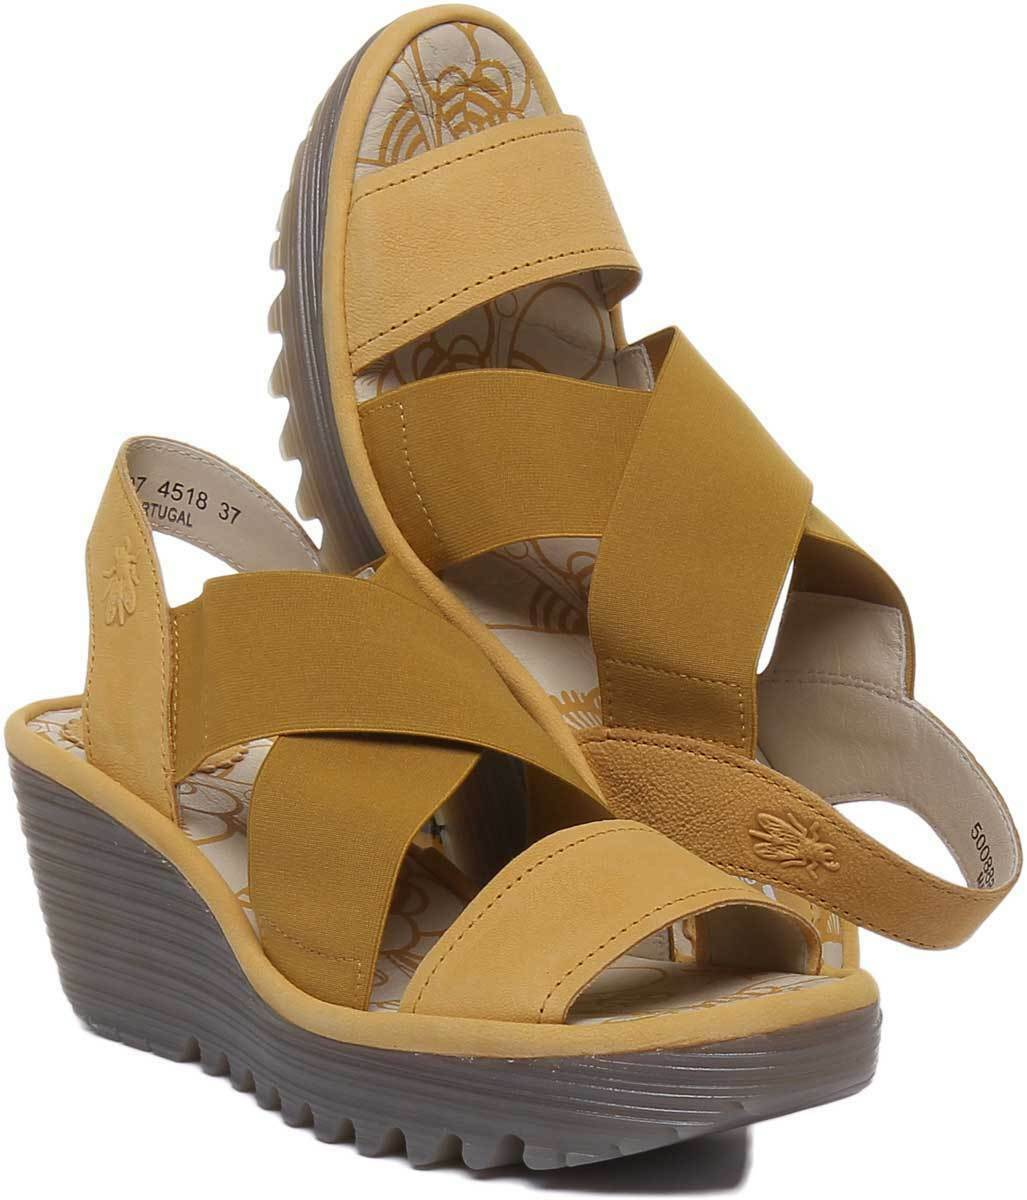 FLY London London London yaji 888 Donne Sandali in giallo in pelle di nabuk TG 54315c